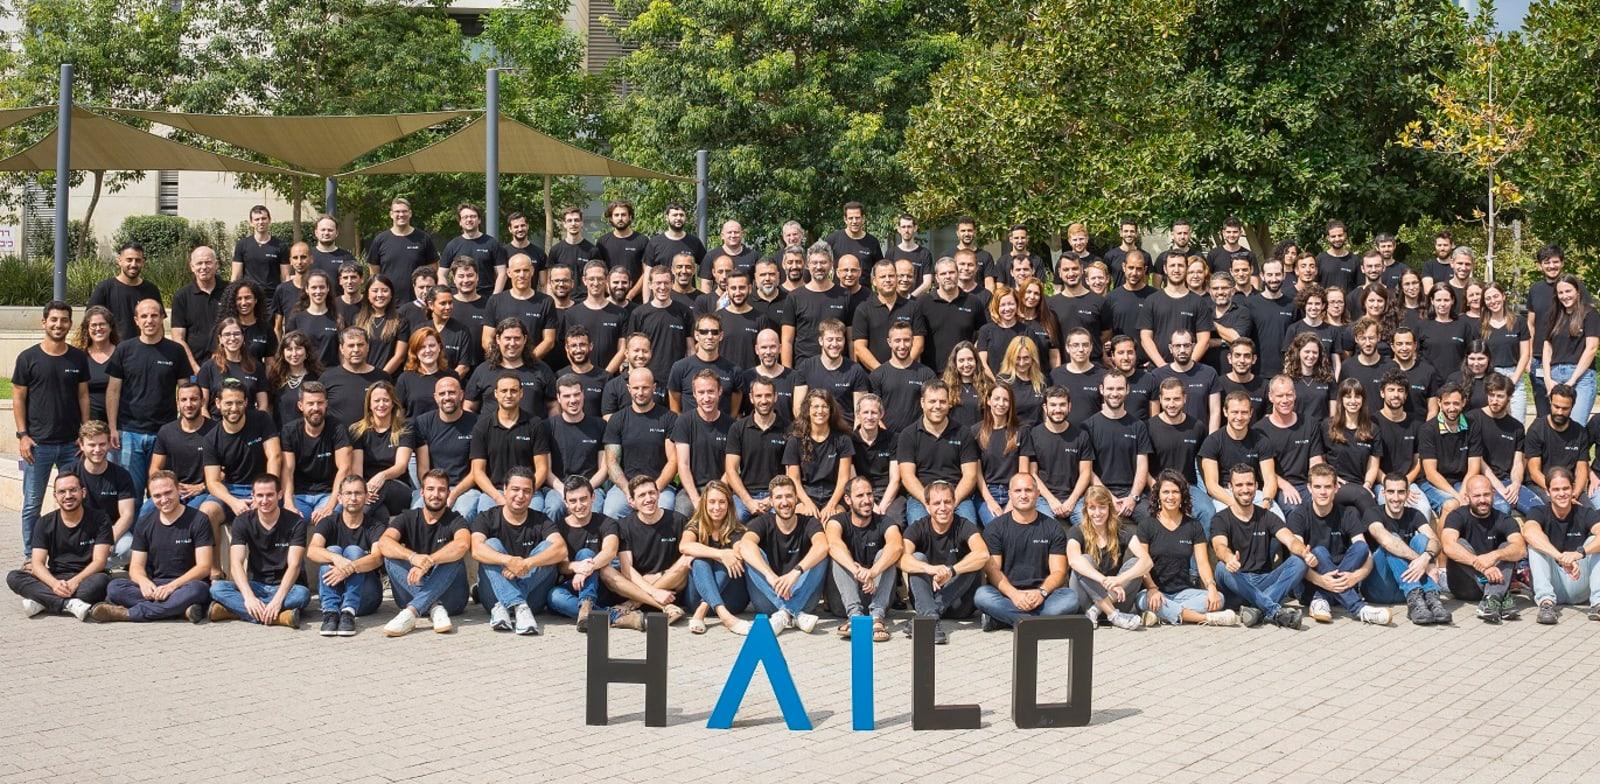 Hailo team Photo: Hailo